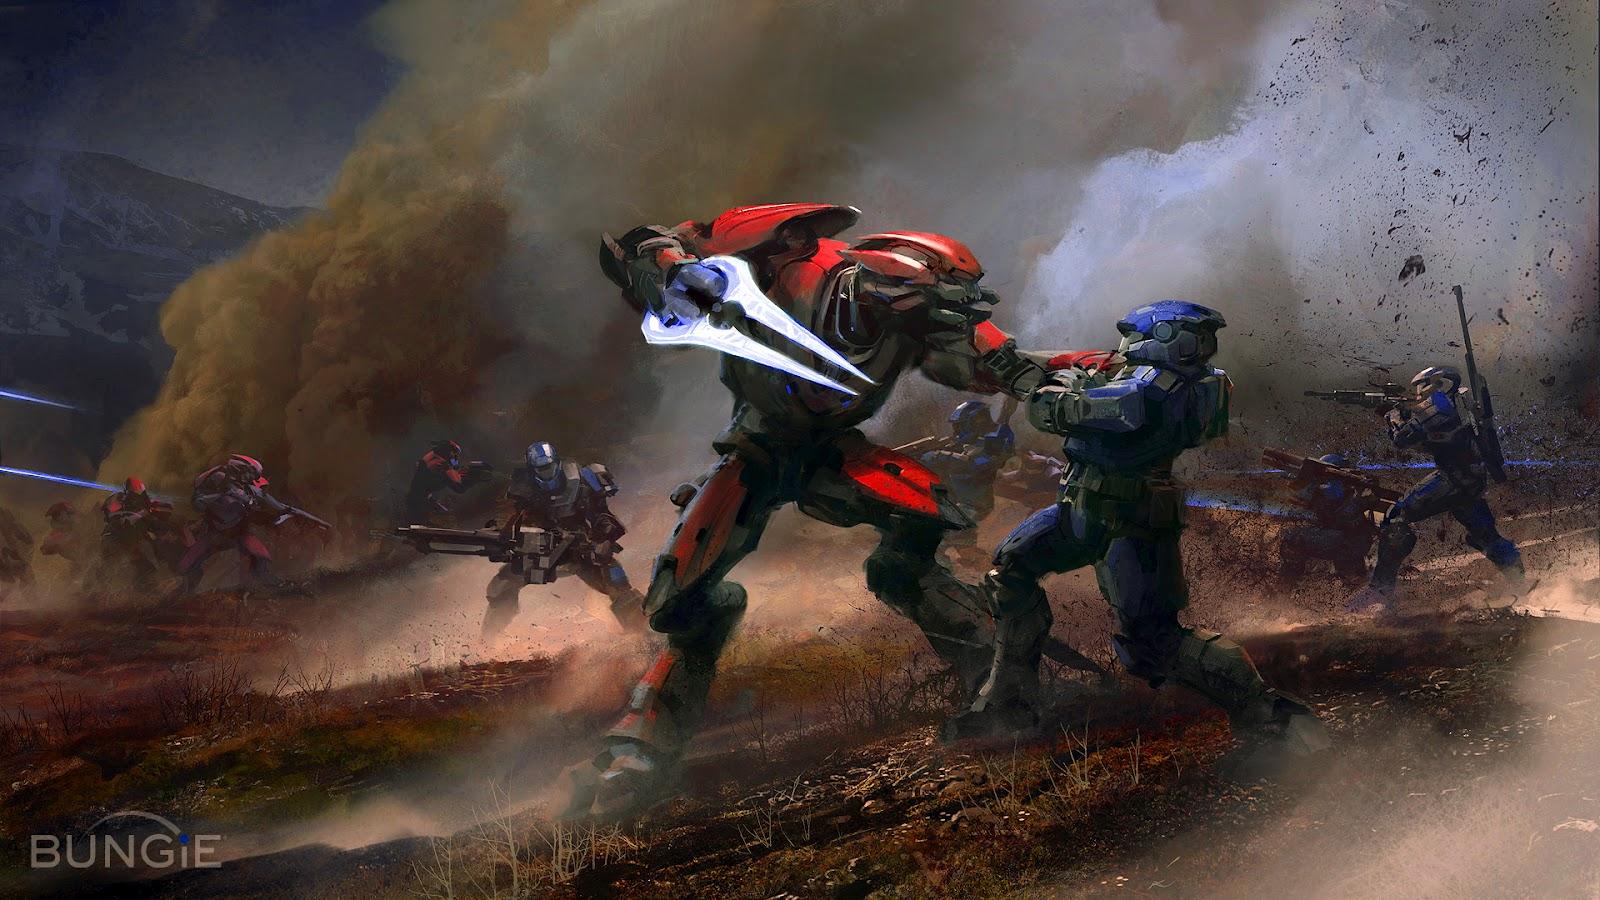 http://4.bp.blogspot.com/-EYmzgfnZ3wo/UA1f8d5DrWI/AAAAAAAAAik/JBKFLErZj1s/s1600/fantasy_paintings_video_games_halo_reach_battles_battle_desktop_1920x1080_hd-wallpaper-569796.jpg